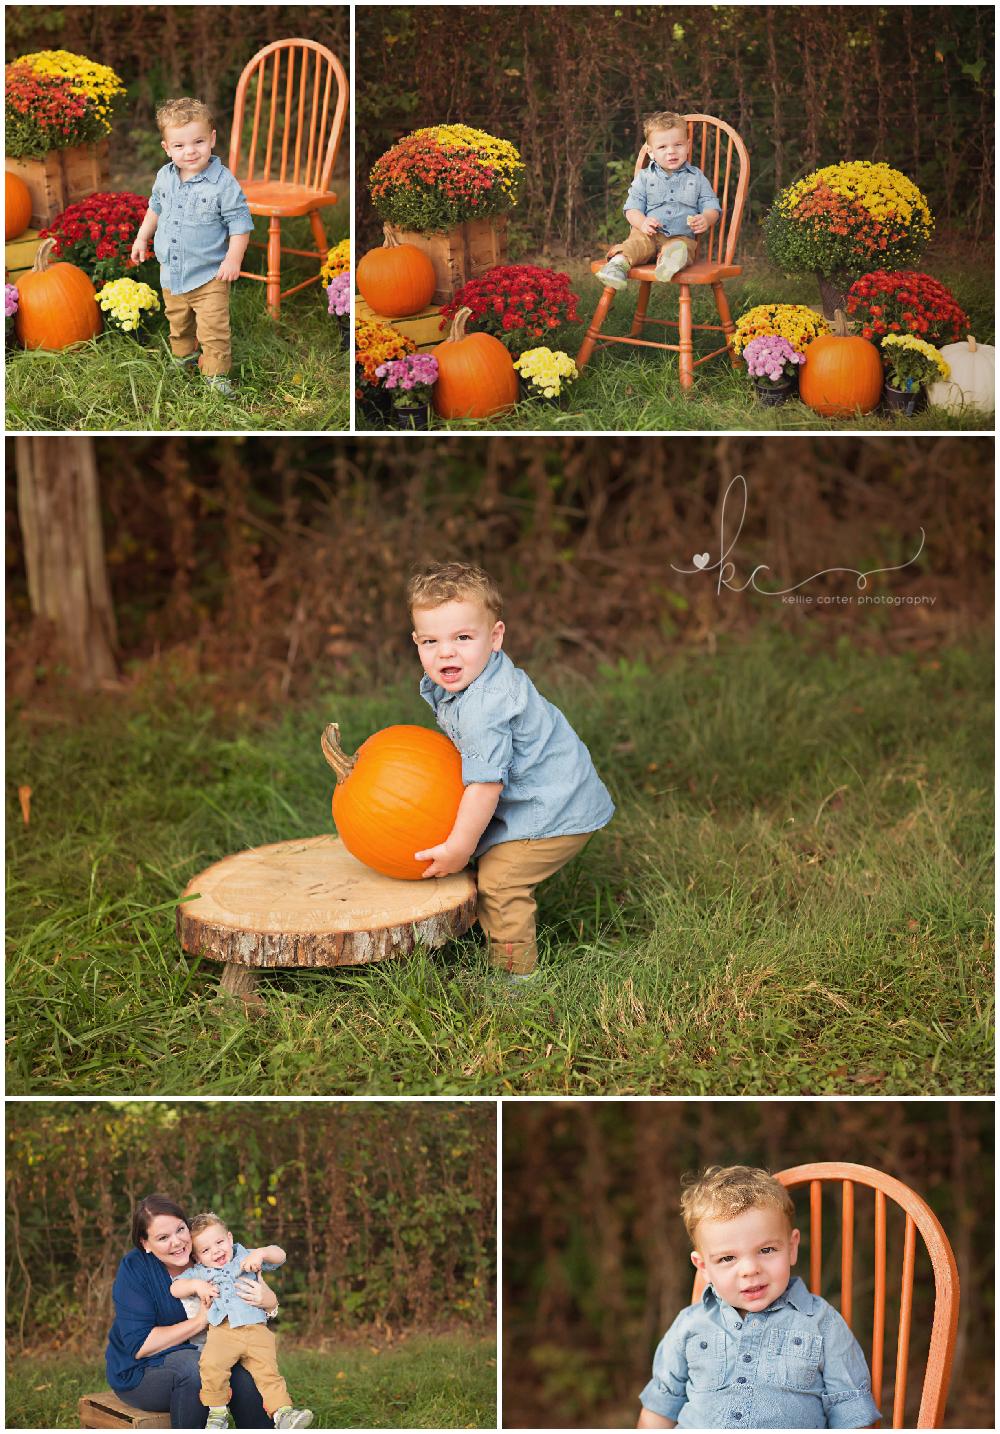 Kellie Carter Photography2 Prather Family Fall Mini Session {Portrait Photographer | Somerset, KY}